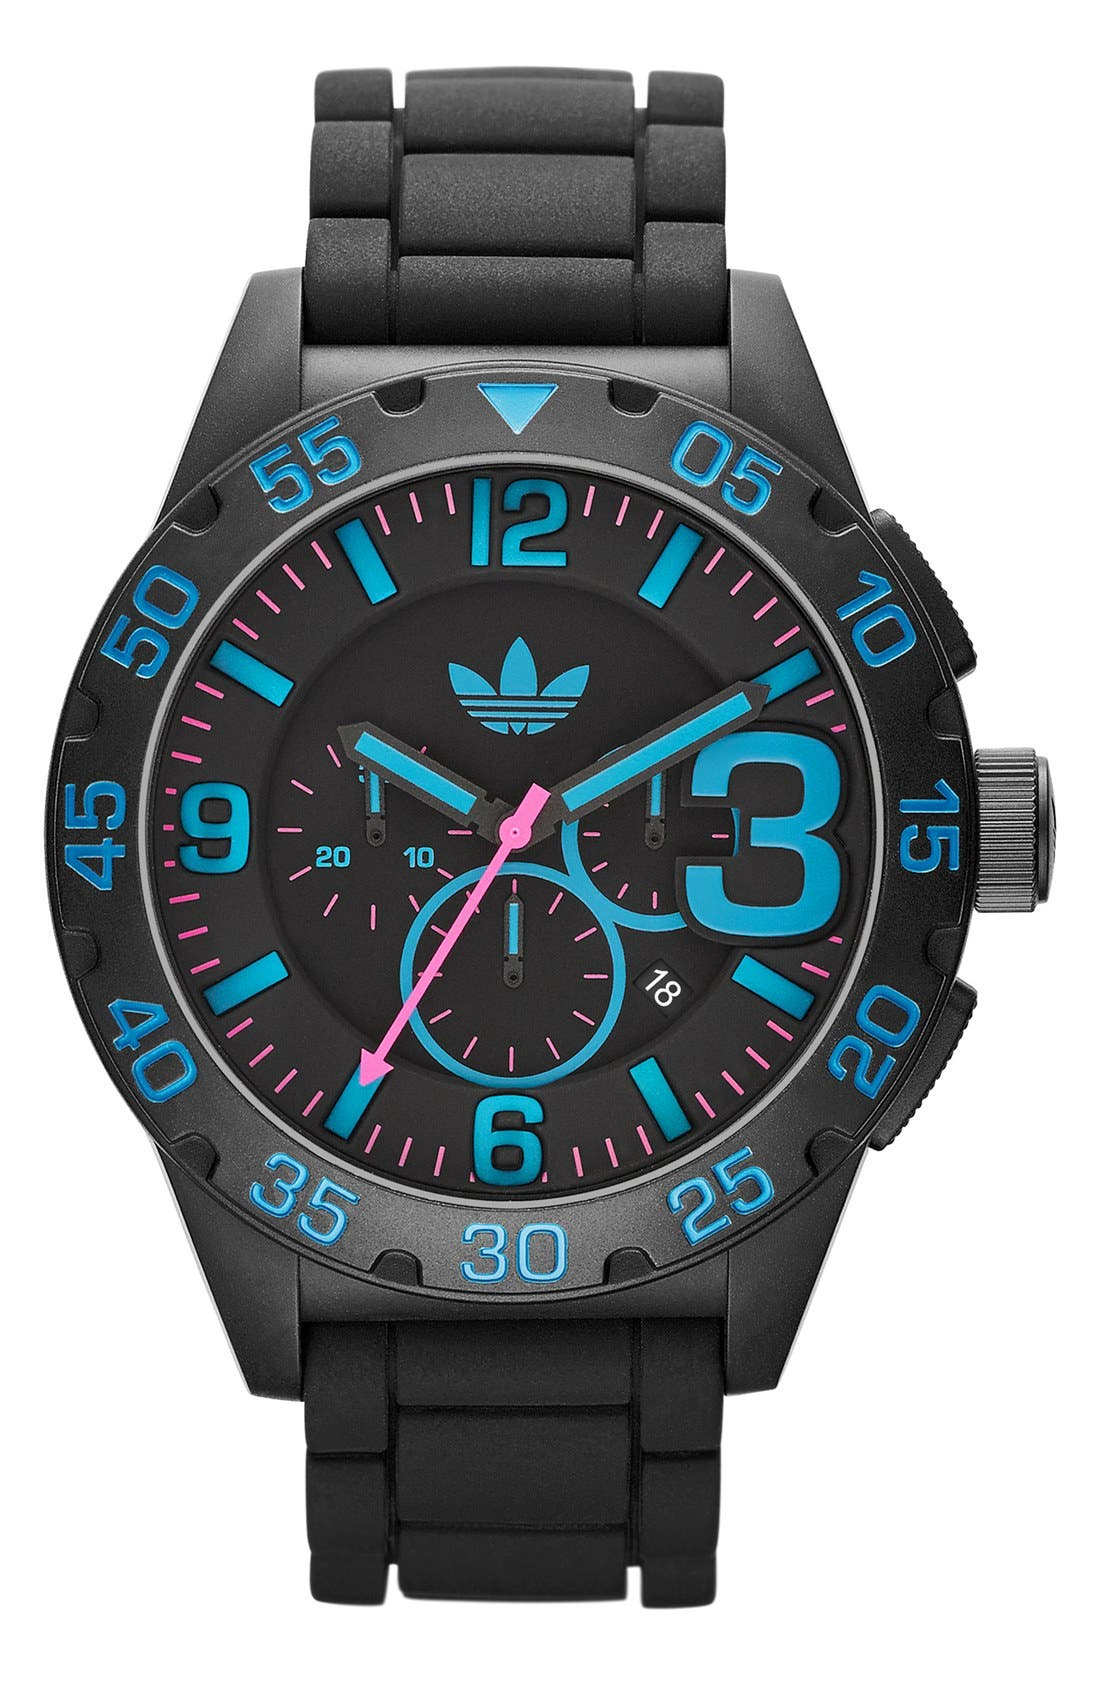 Main Image - adidas Originals 'Newburgh' Chronograph Silicone Strap Watch, 48mm